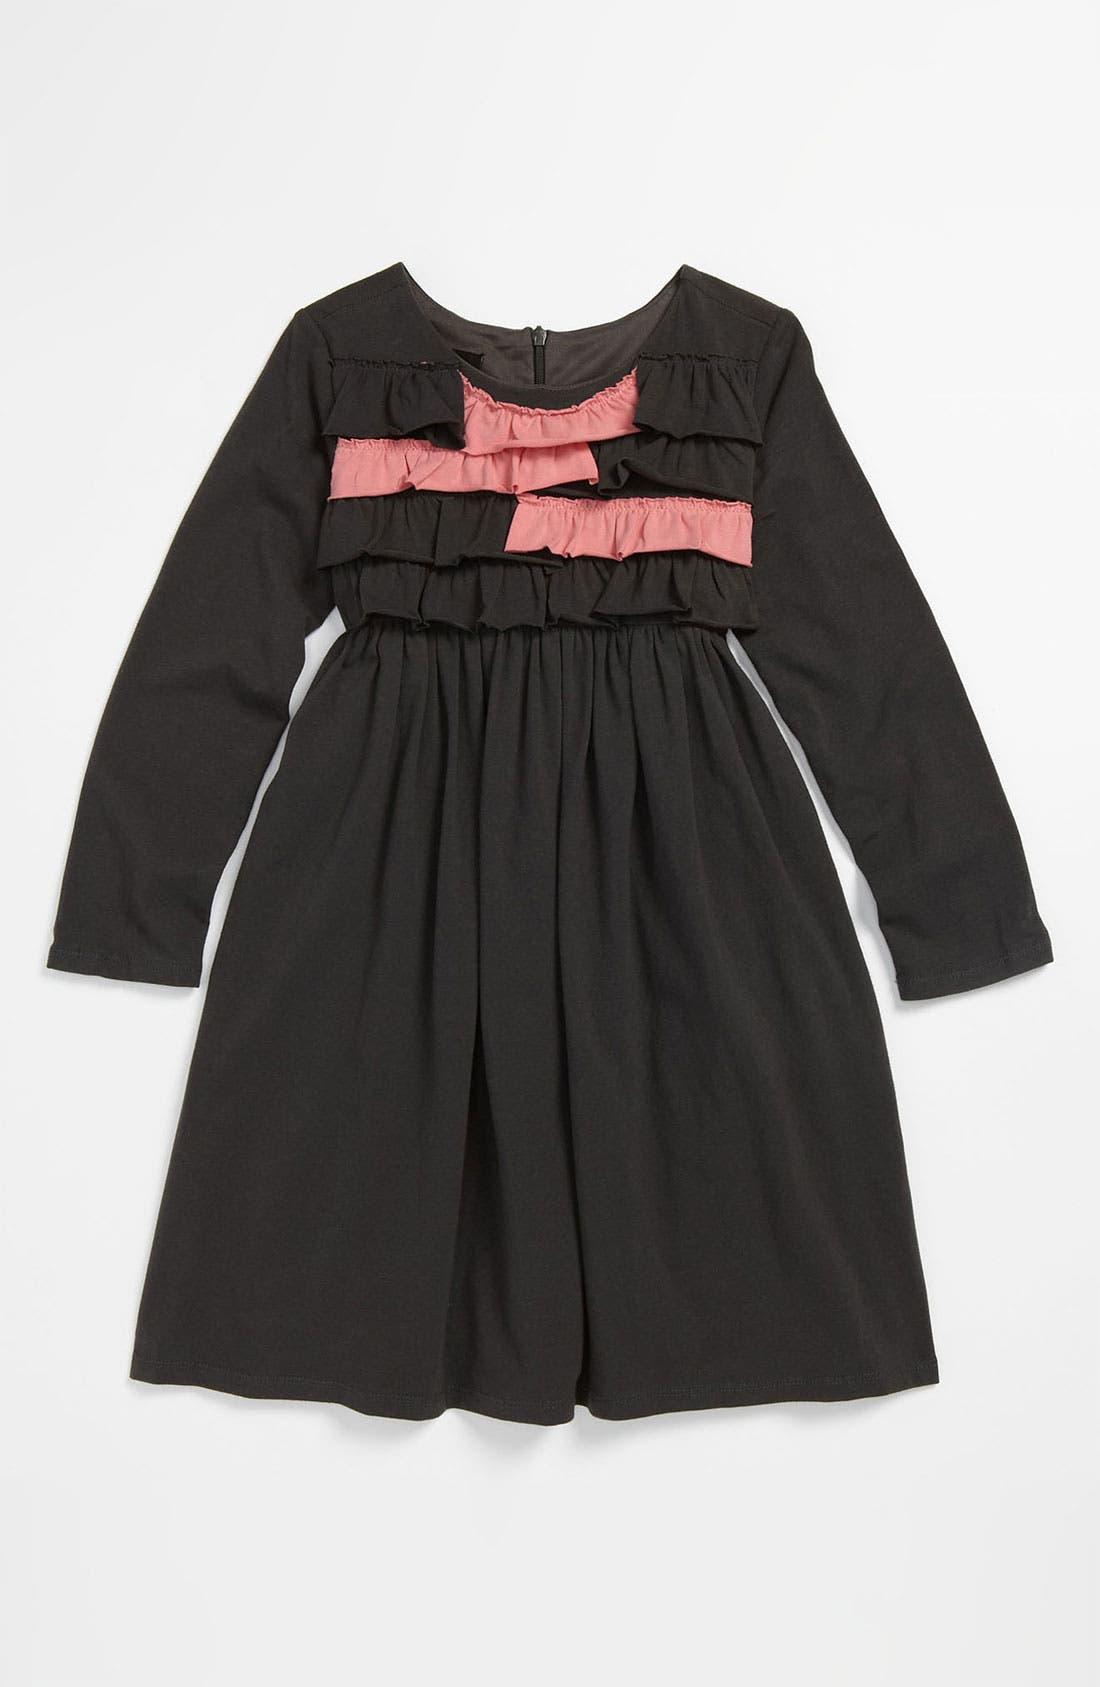 Main Image - Isobella & Chloe 'Darlene' Dress (Little Girls & Big Girls)